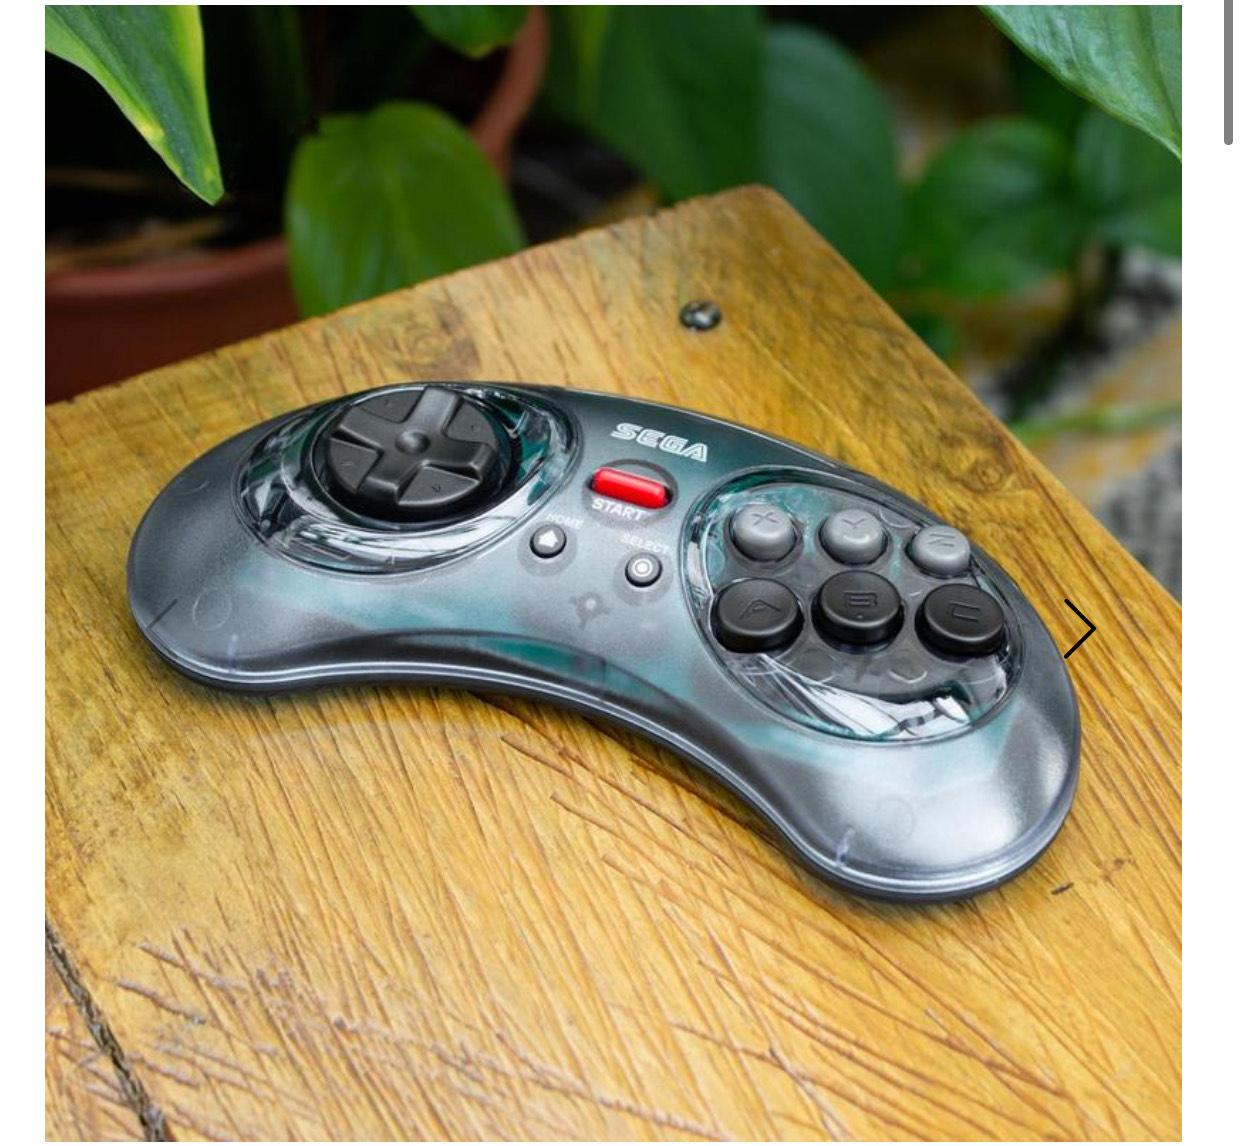 RETRO-BIT Sega Mega Drive 2.4G Wireless Blue Controller £24.99 + £2 del at Sega Shop UK